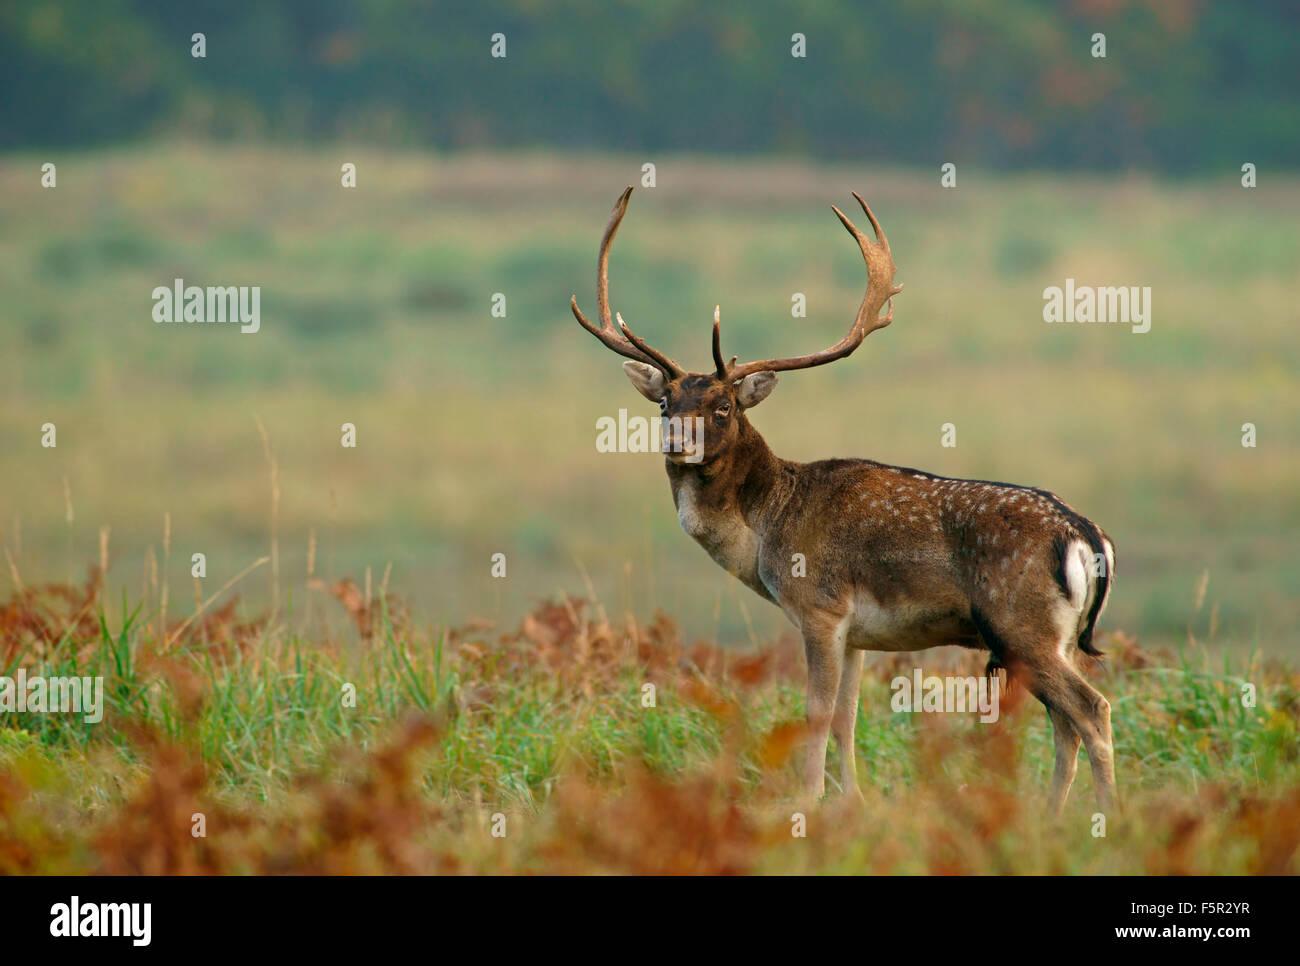 Fallow deer (Dama dama), buck, Hesse, Germany - Stock Image